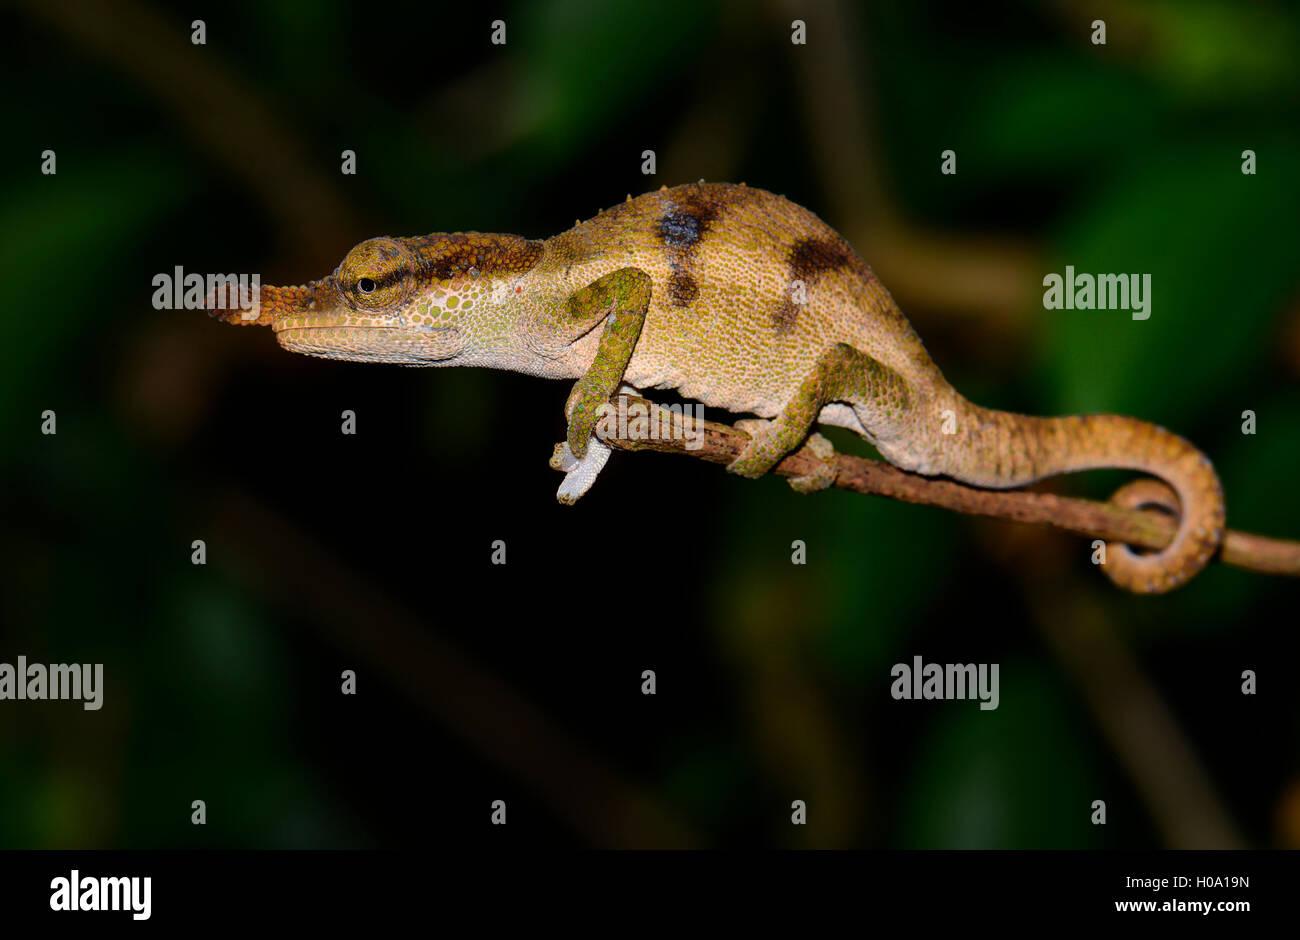 Chameleon (Calumma linotum), male, rainforest, Montagne d'Ambre, northern Madagascar - Stock Image